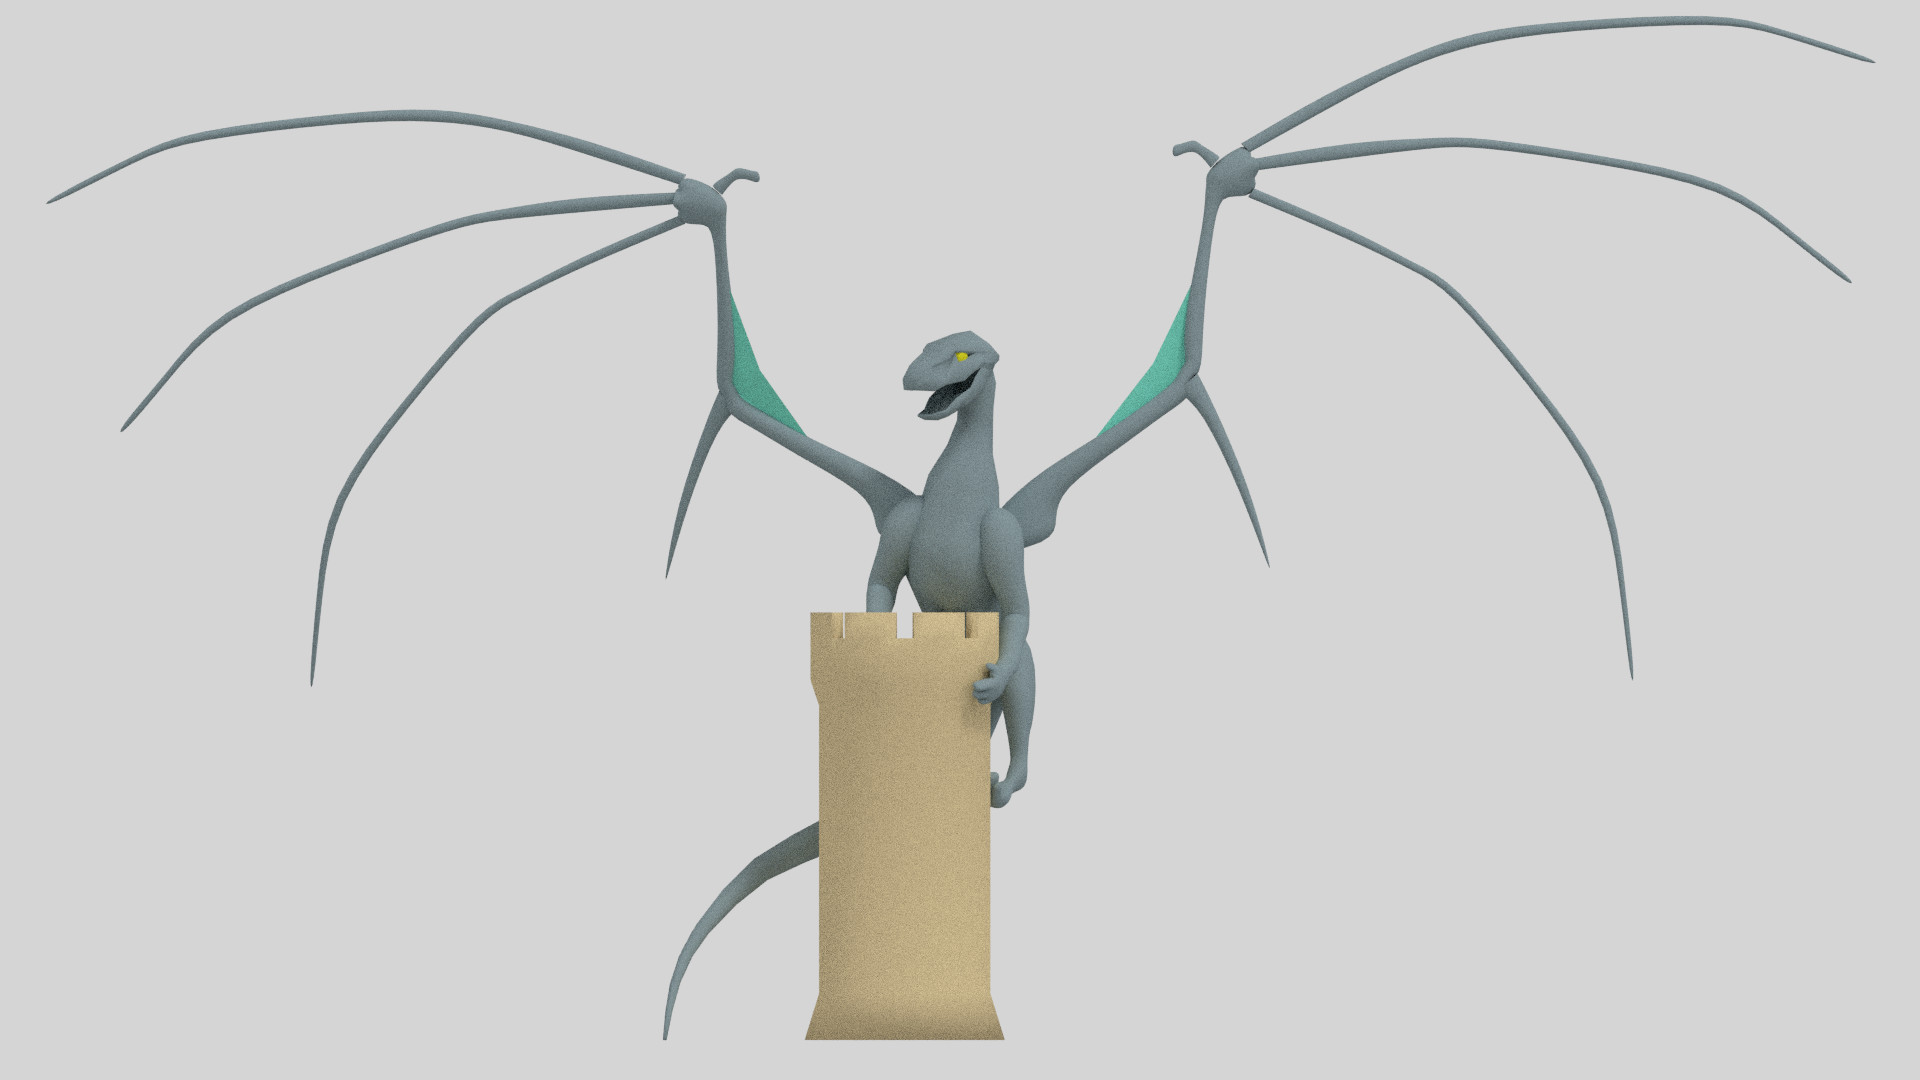 Julian granke drake previsualisierung 1